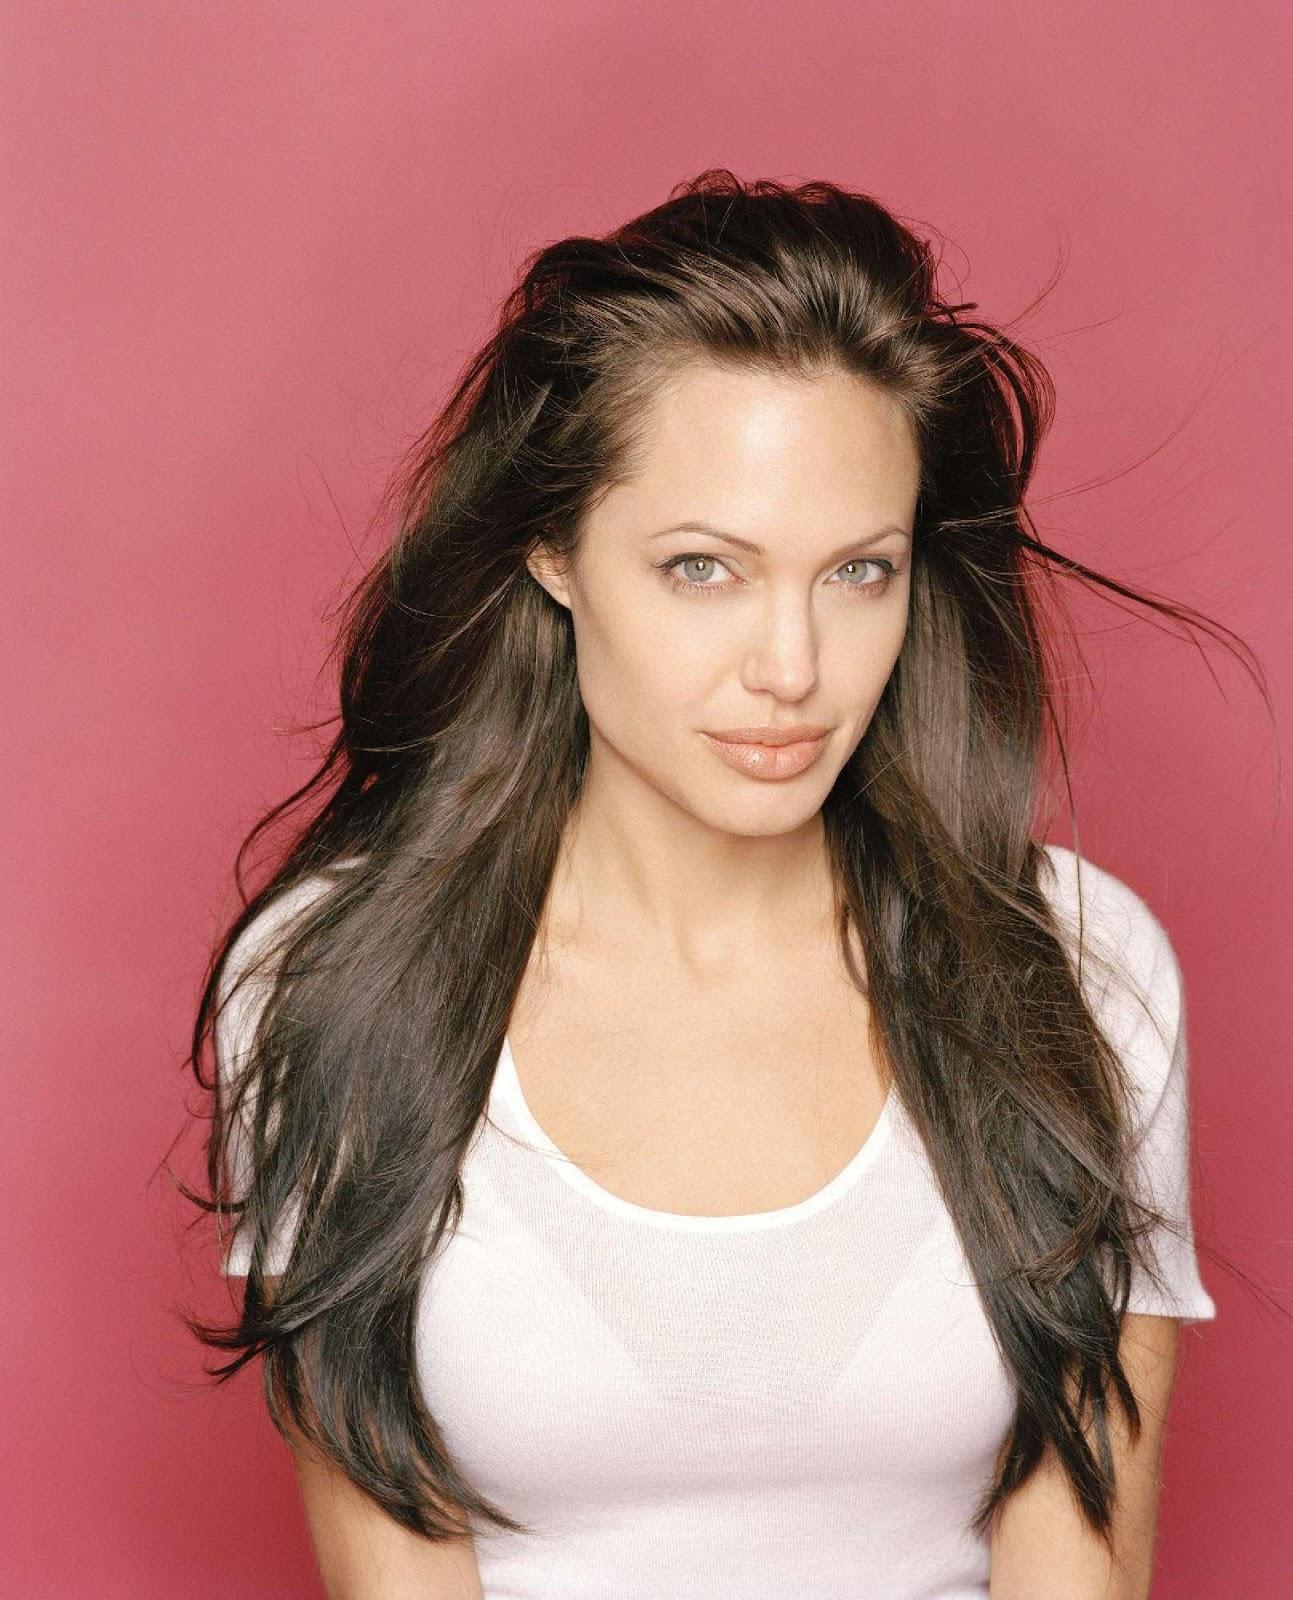 Hot Actress, Models, Heroine And Celebrities Hot Photos -6882